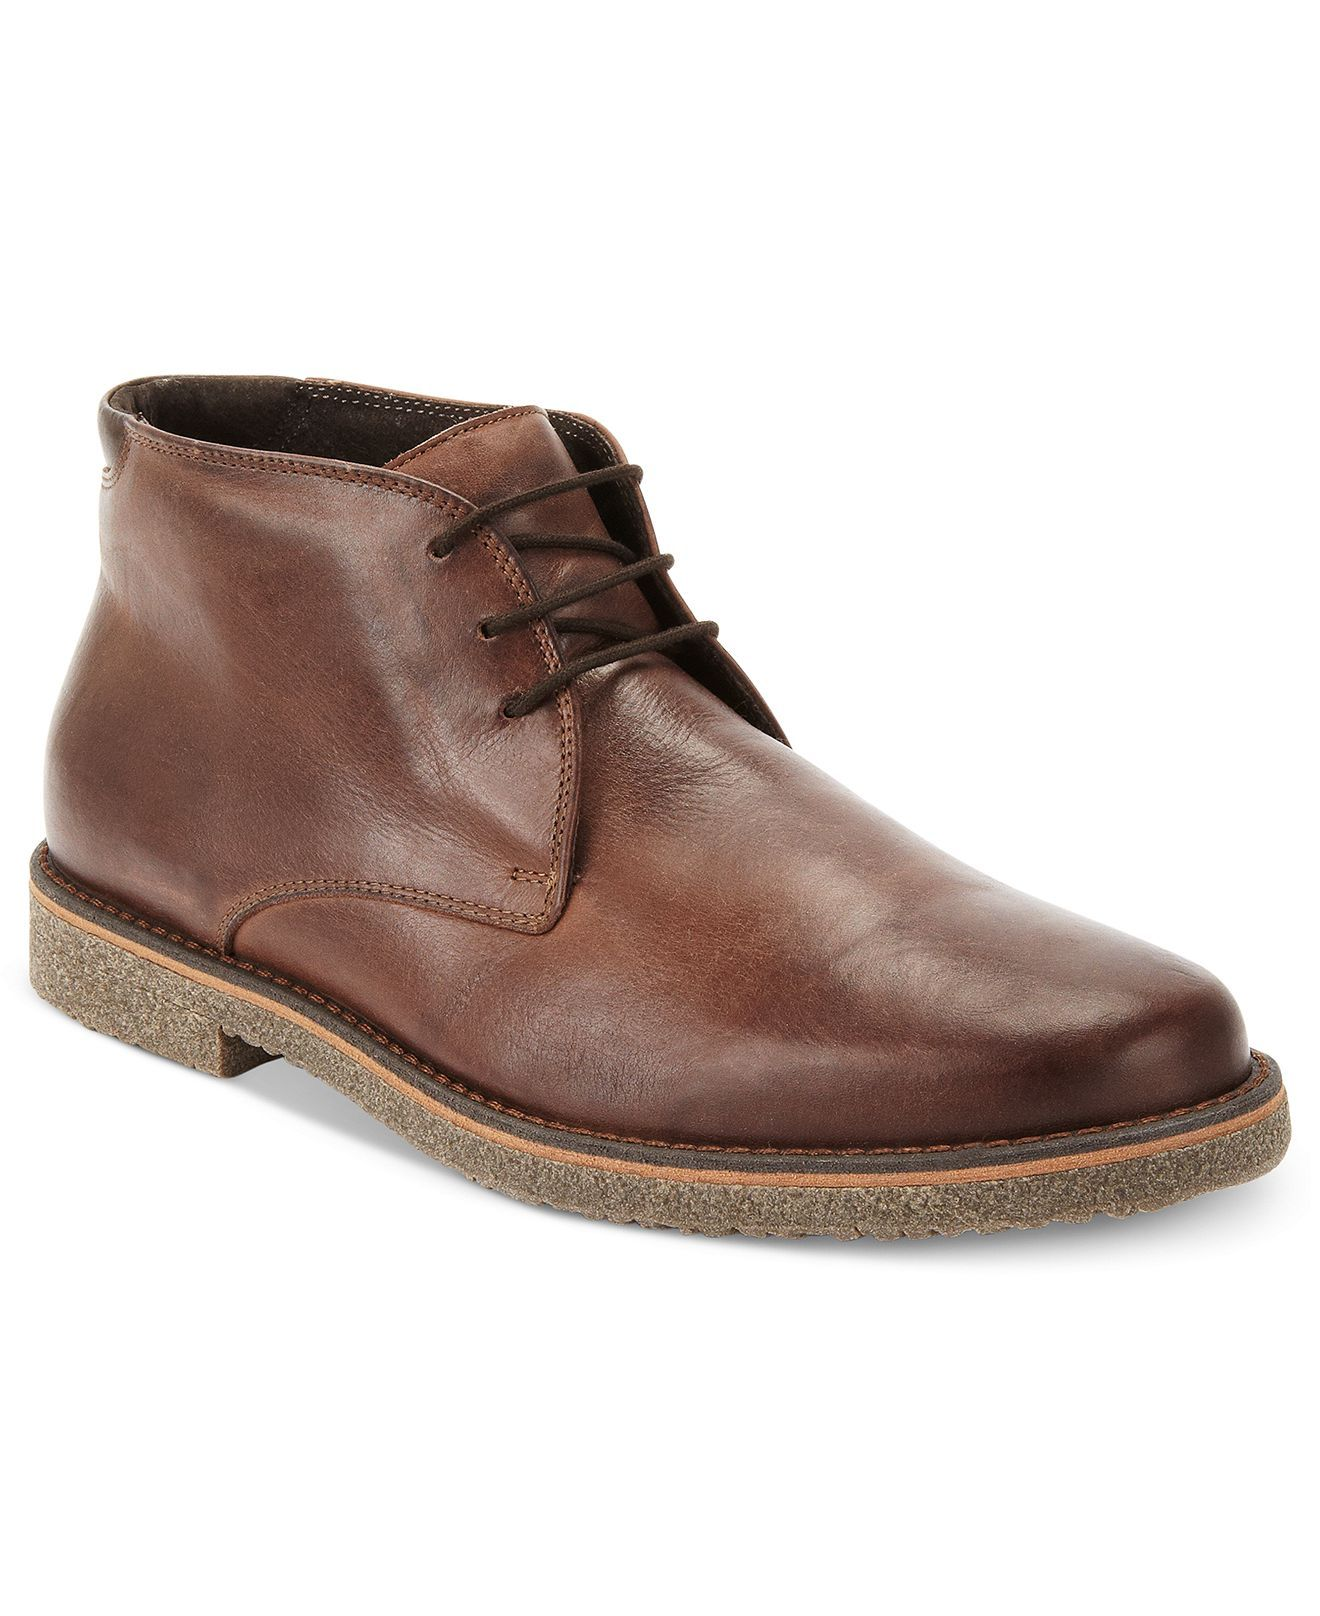 Alfani Boots, Lancer Leather Chukka Boots - Shoes - Men - Macy's ...